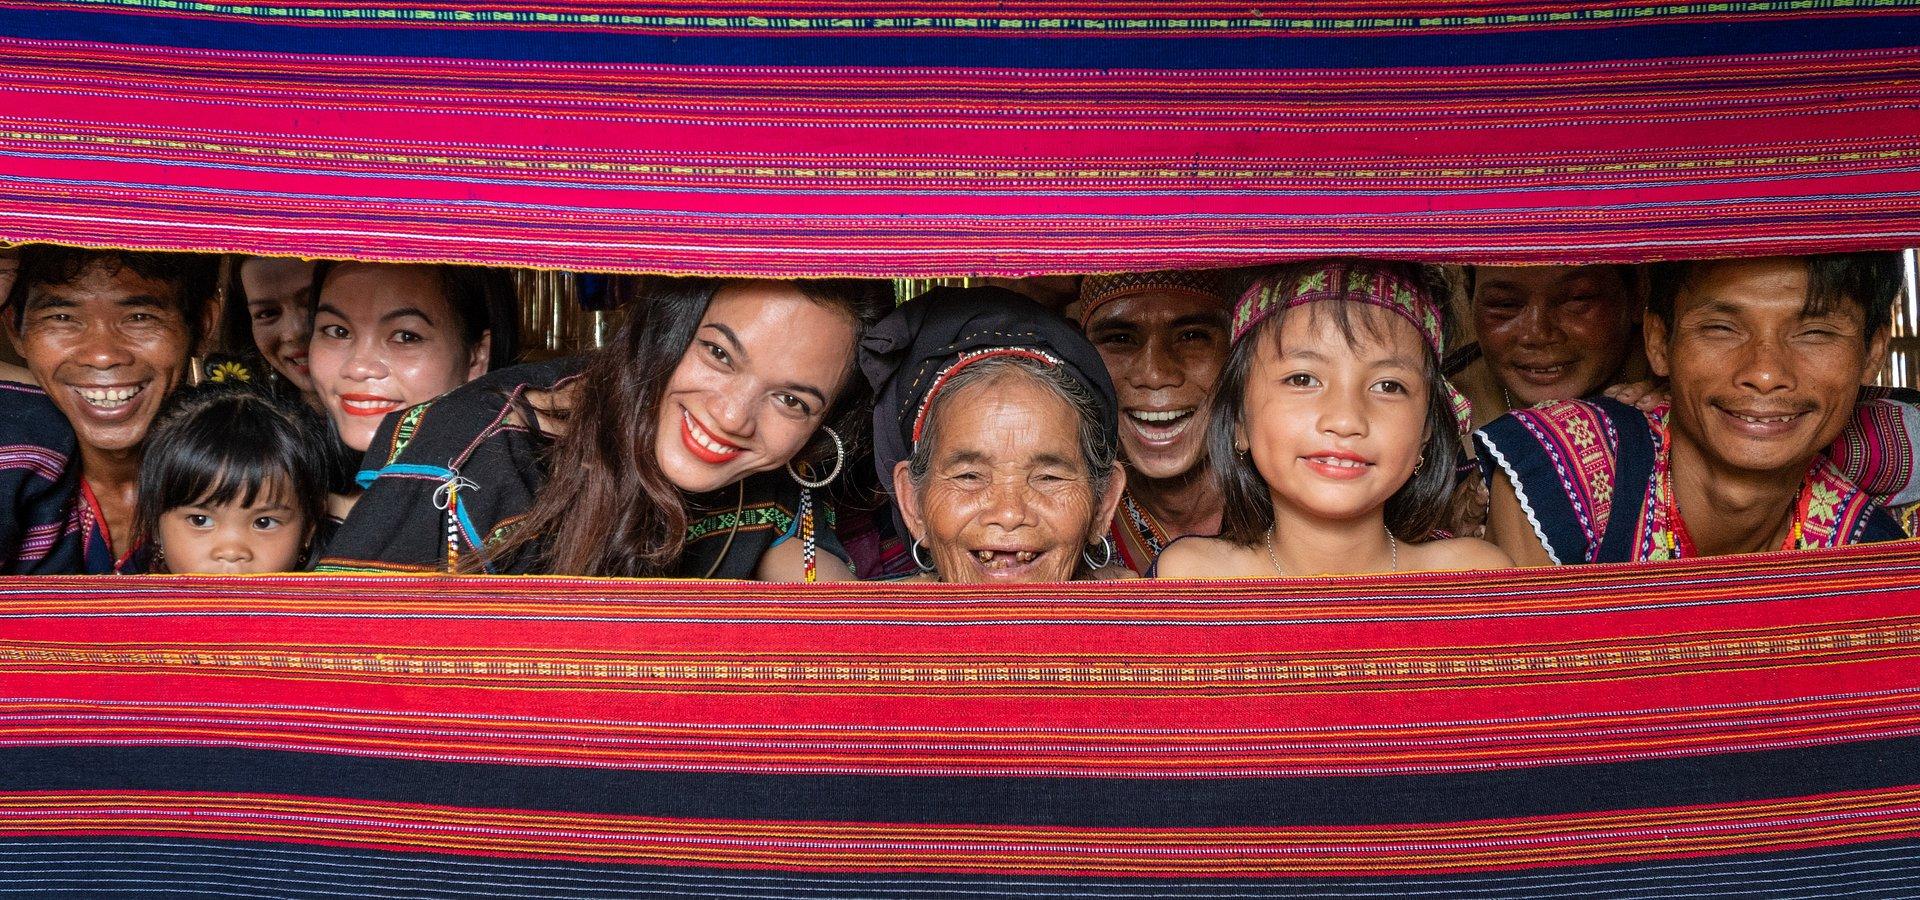 Heartwarming photos of families around the world in AGORA's #Family2019 Photo Contest